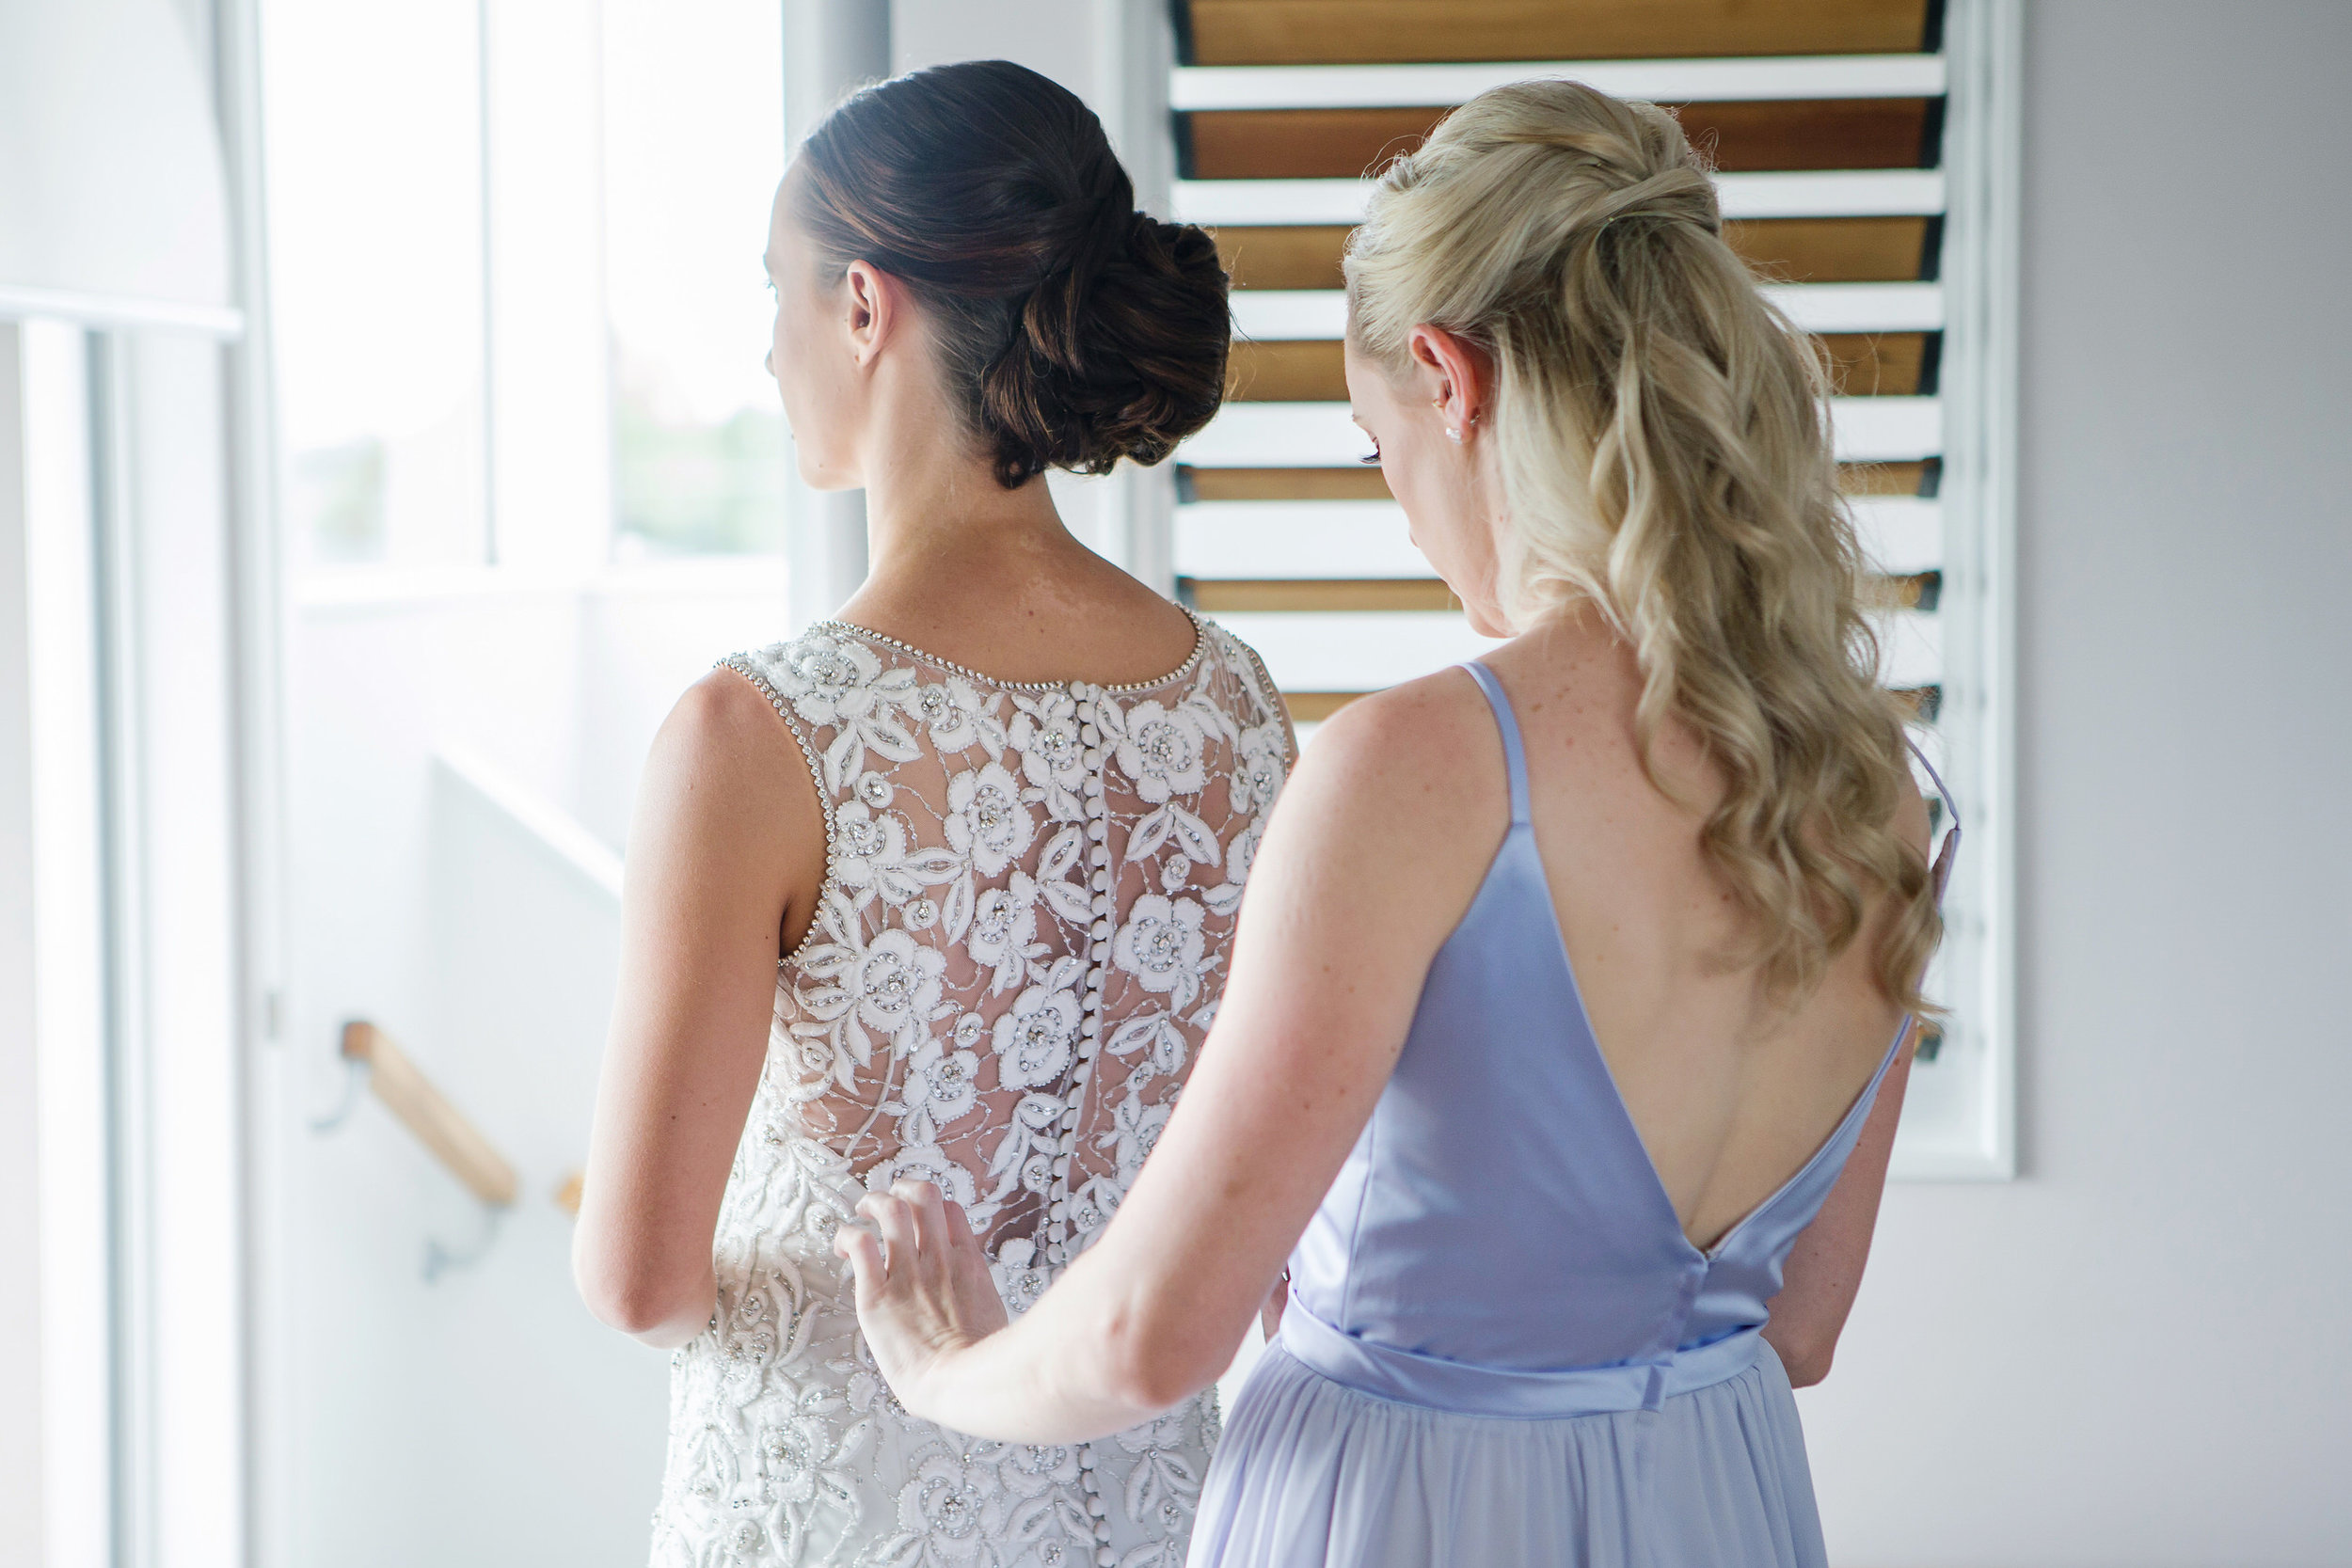 Martinborough-Poppies-Wedding-Caine-Eloise-Toni-Larsen-0025.jpg